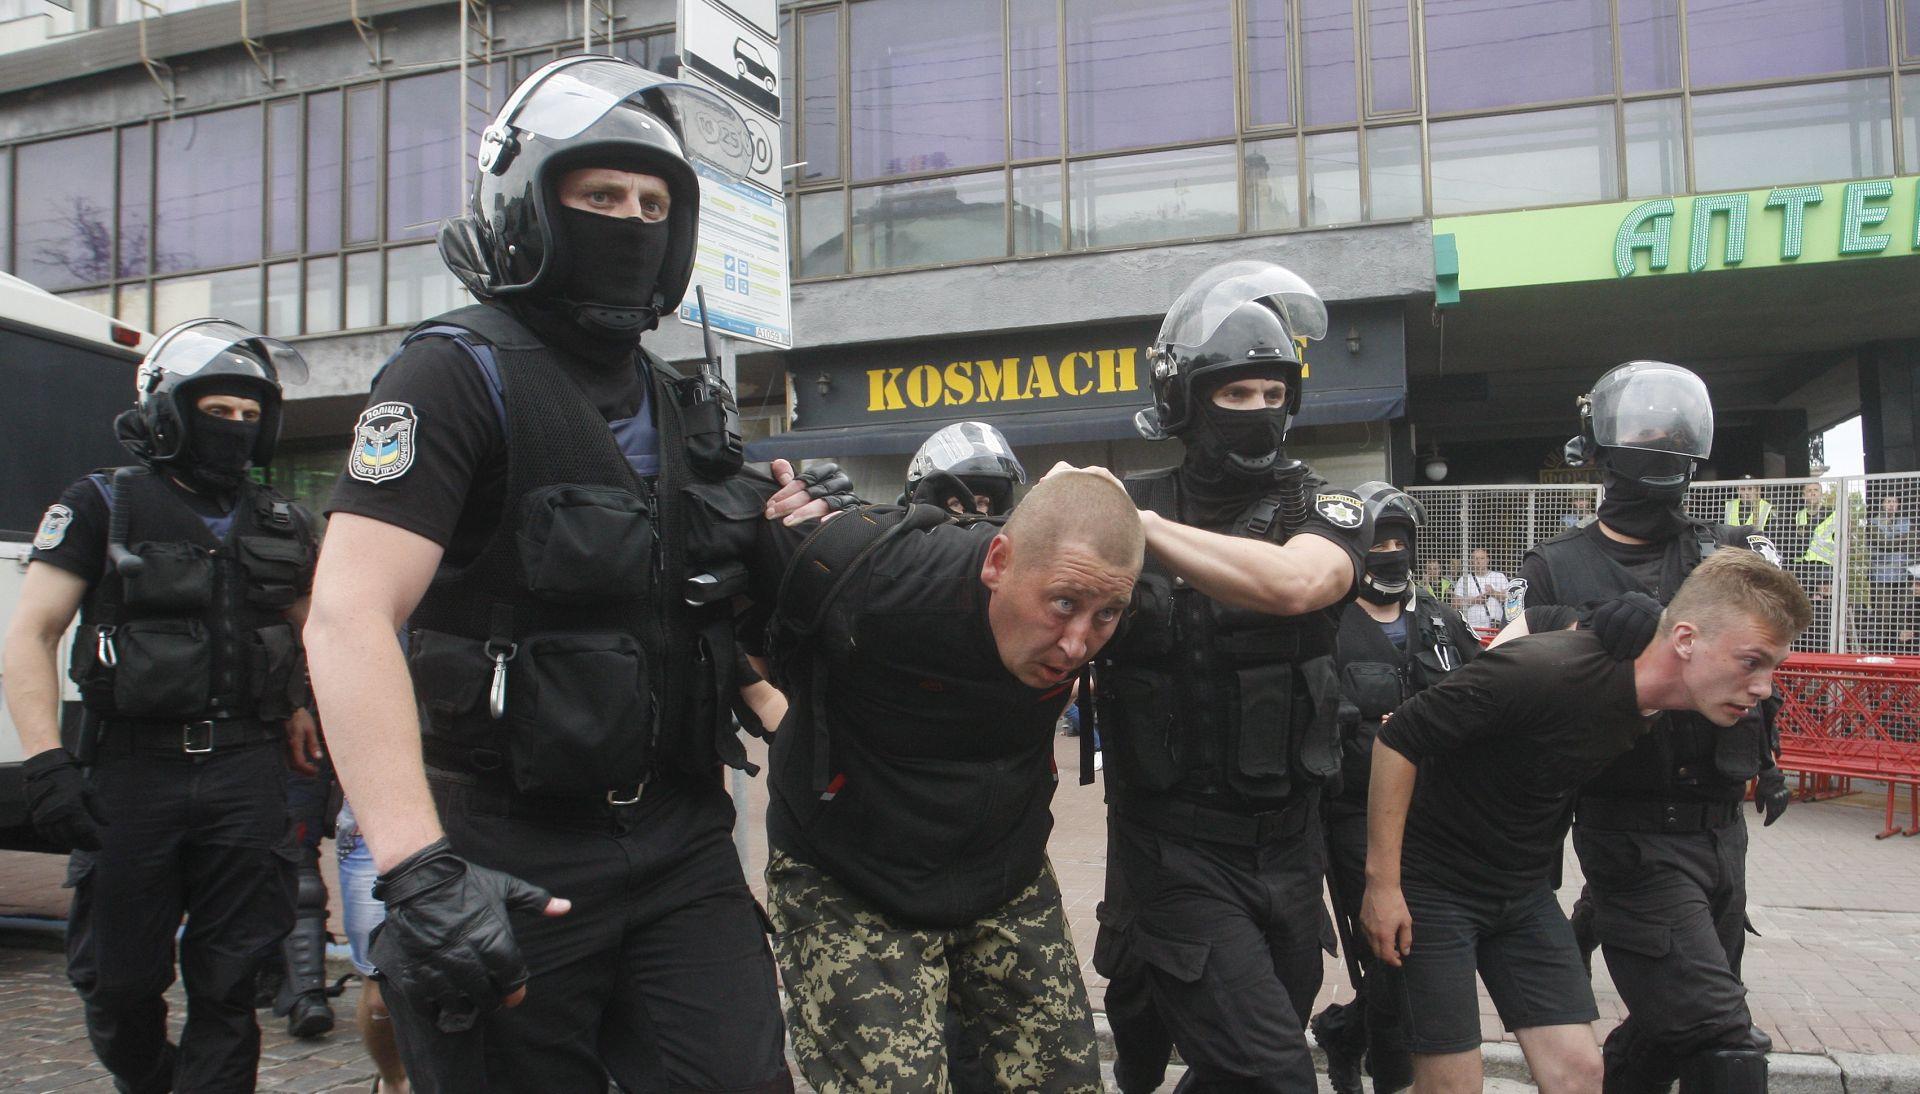 Kijevska policija privela 56 ekstremnih prosvjednika protiv Parade ponosa